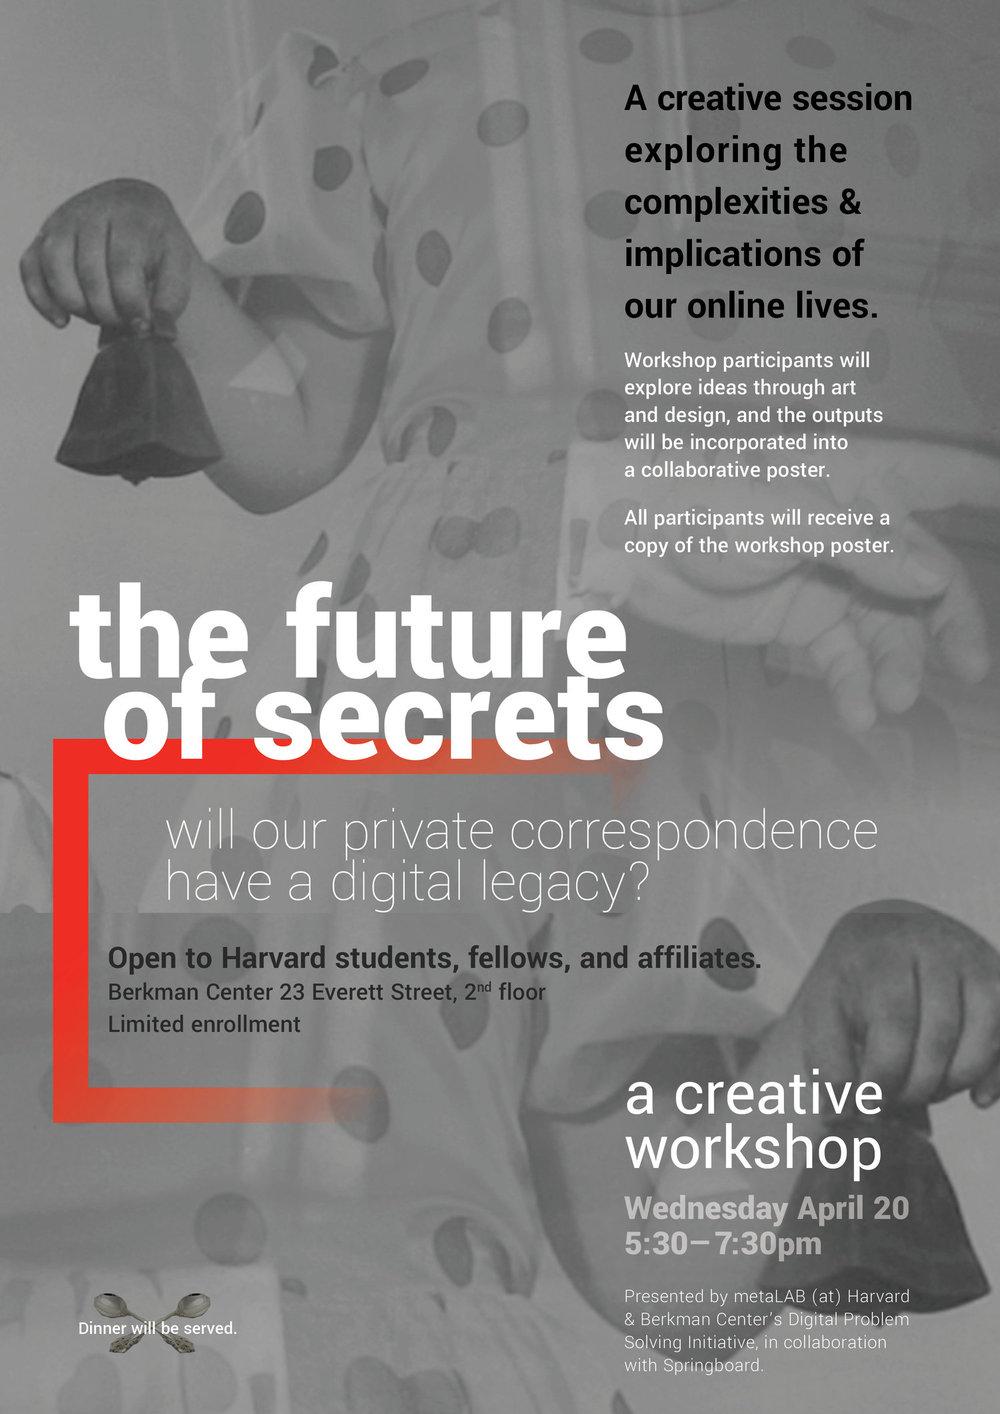 FutureofSecrets_flyer+print.jpg